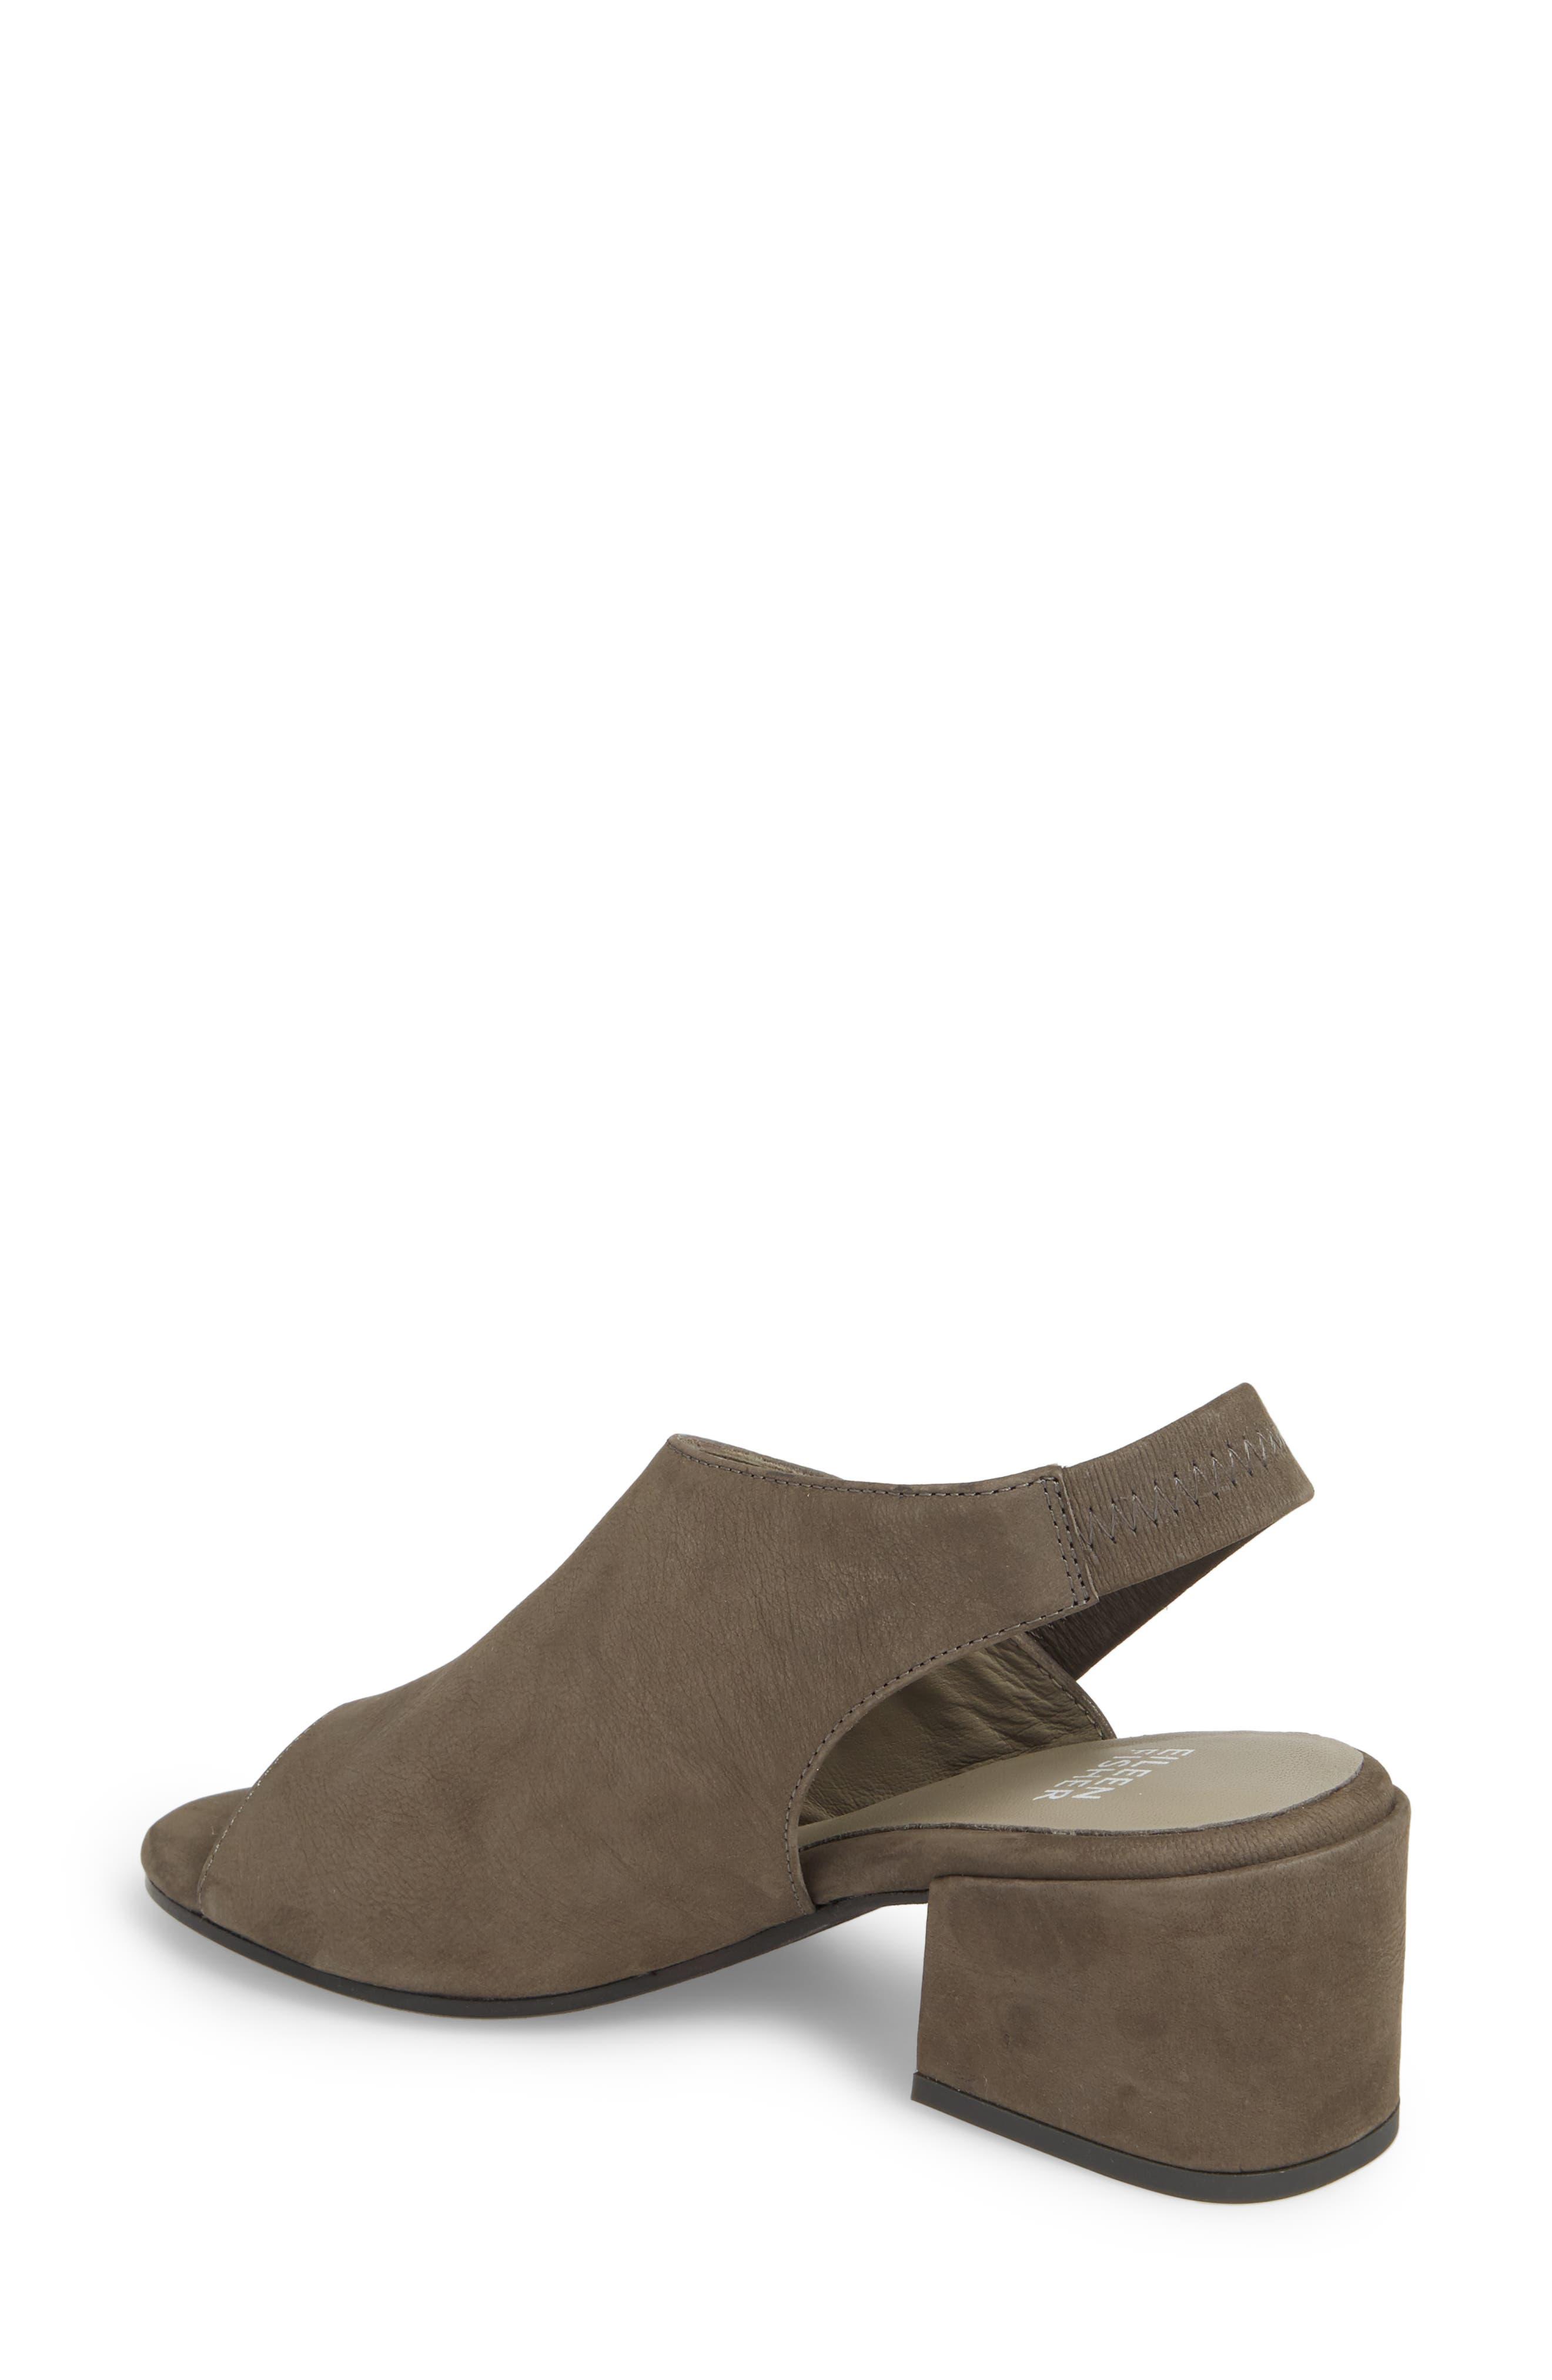 Leigh Asymmetrical Slingback Sandal,                             Alternate thumbnail 6, color,